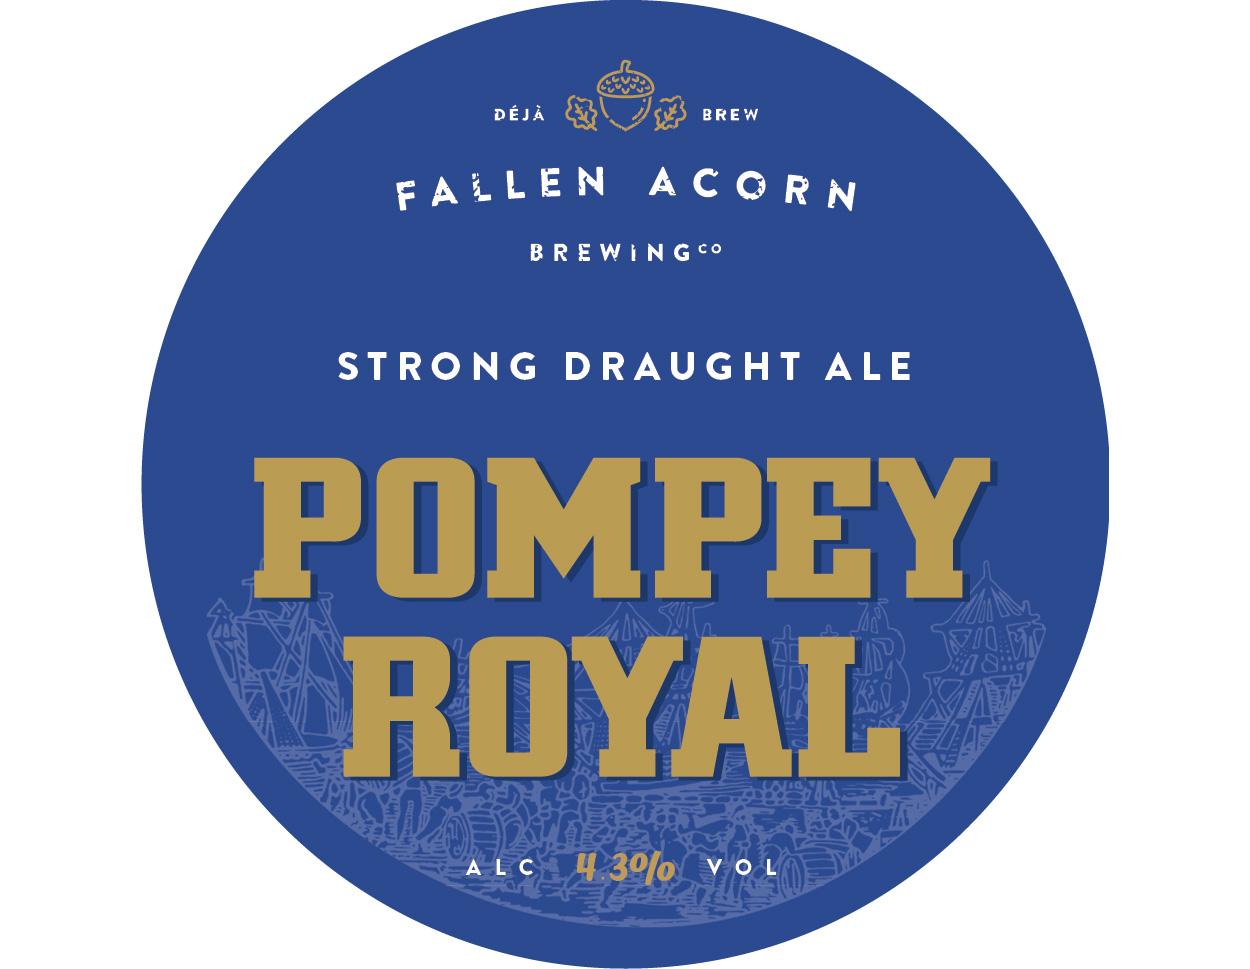 pompey Royal.jpg